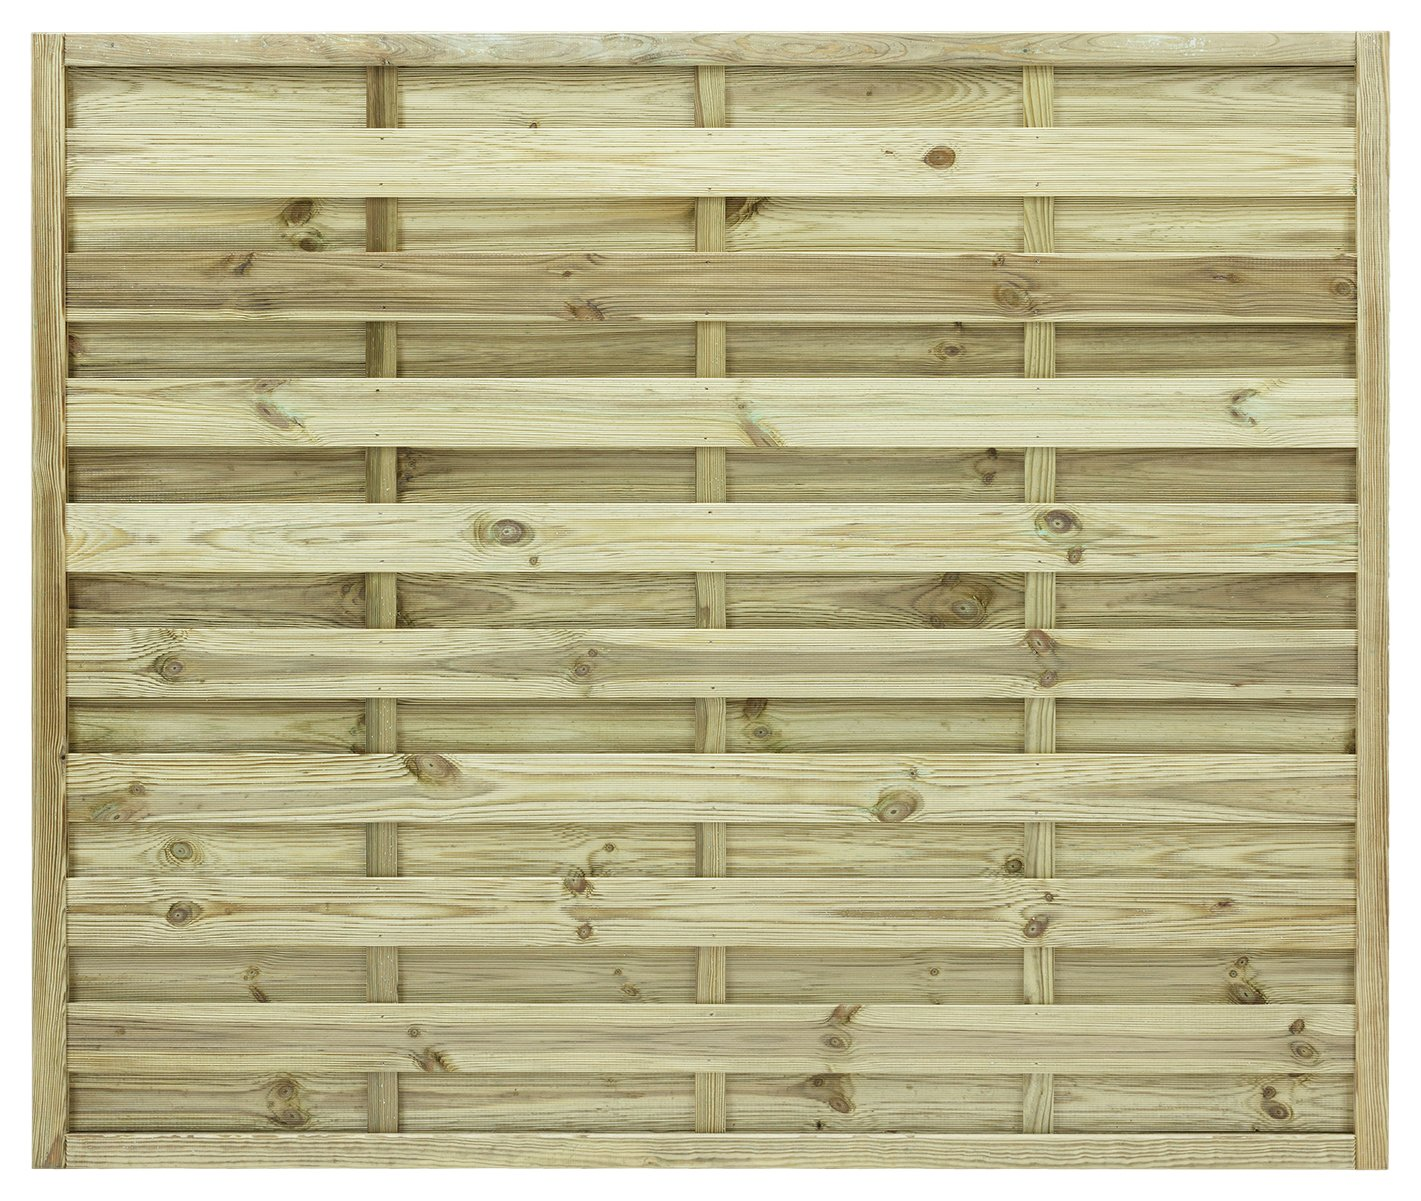 Grange 1.5m St Espirit Square Fence Panel - Pack of 5. lowest price